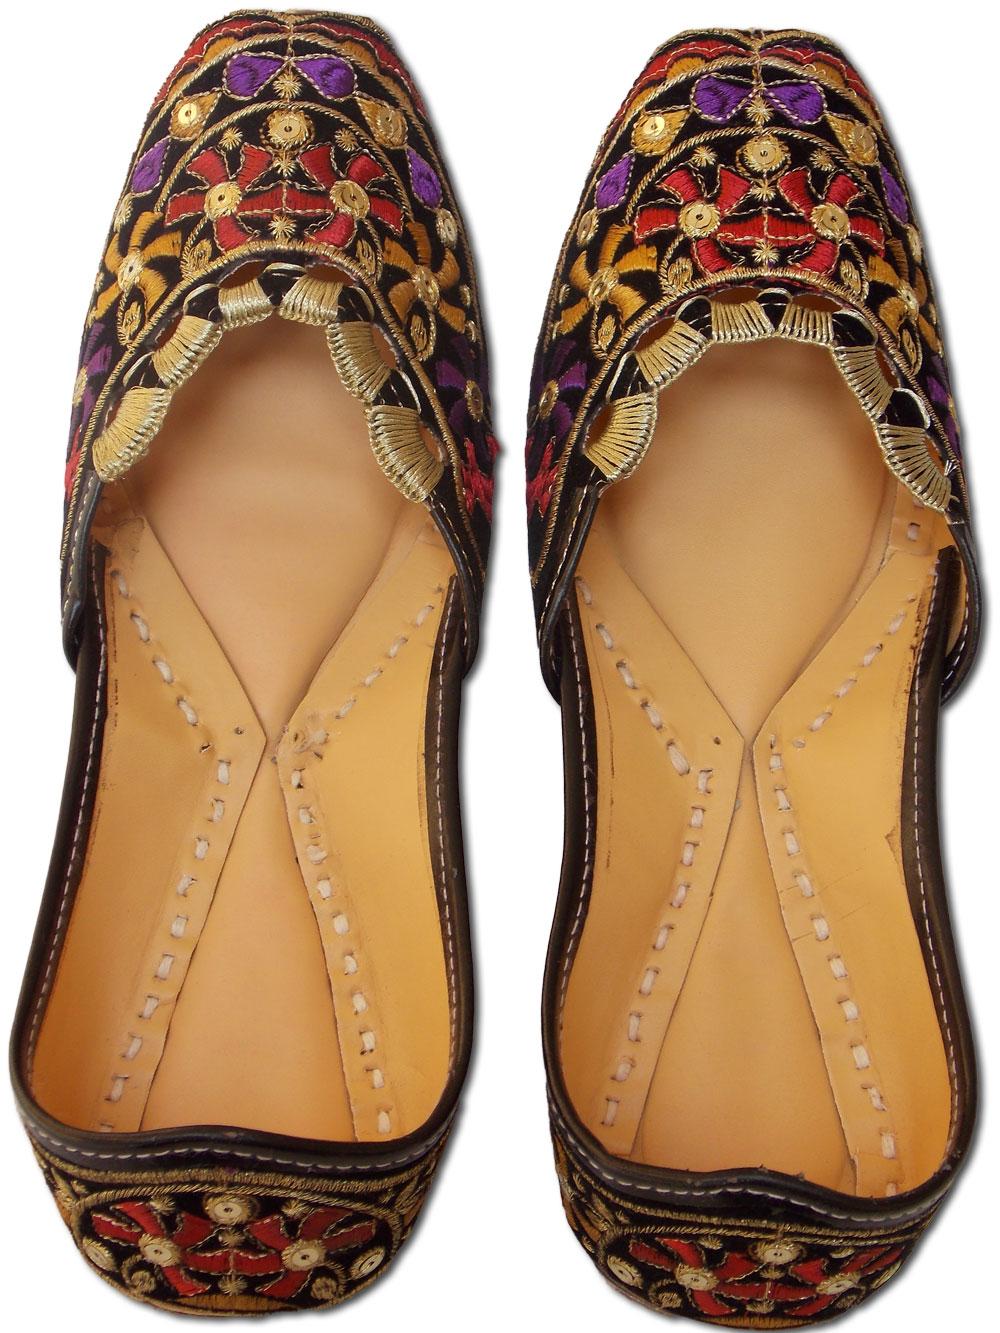 Fashion designer sketches shoes